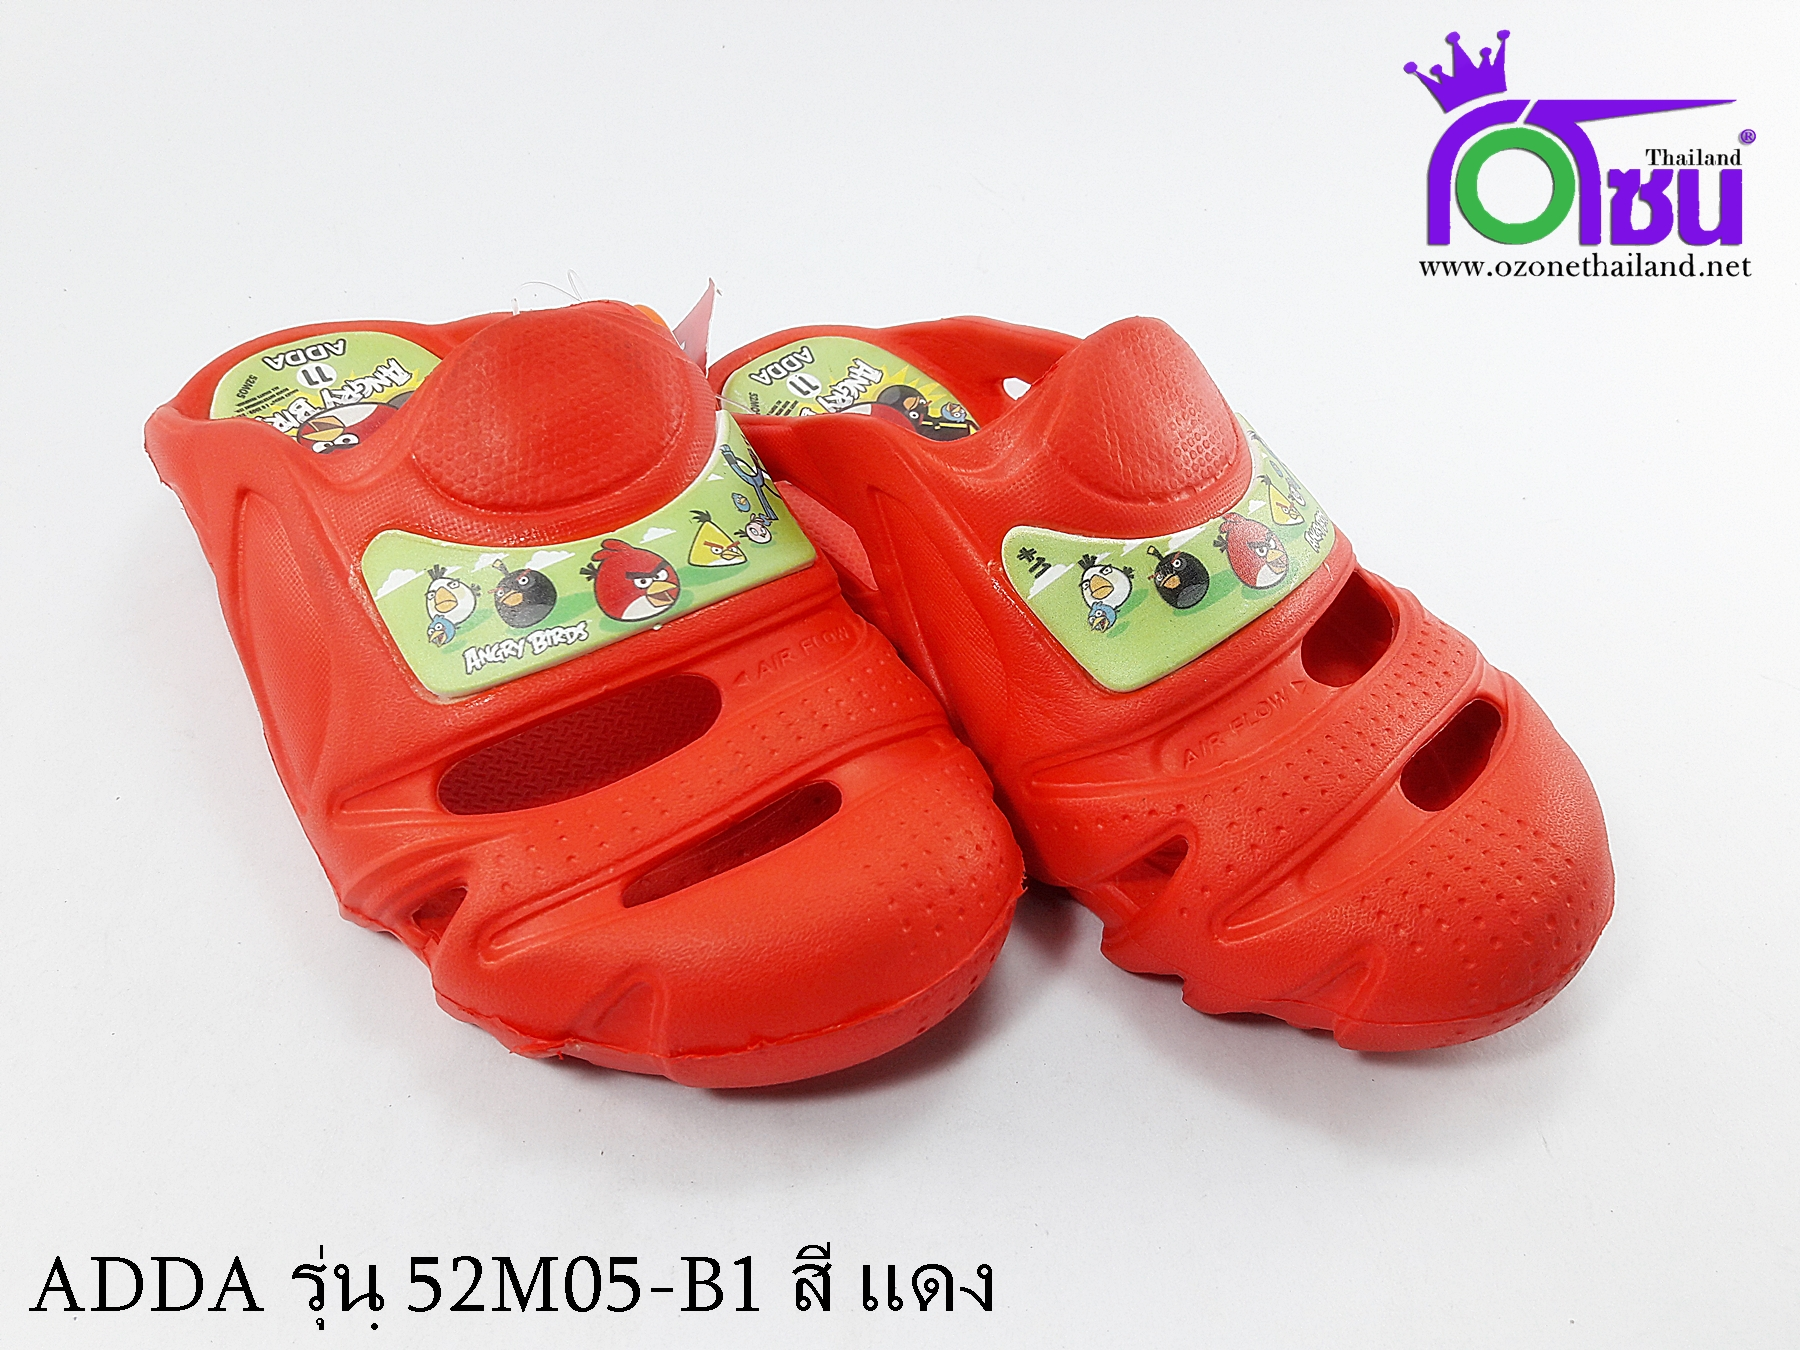 ADDA เด็ก รุ่น 52M05-B1 สีแดง เบอร์ 11-3